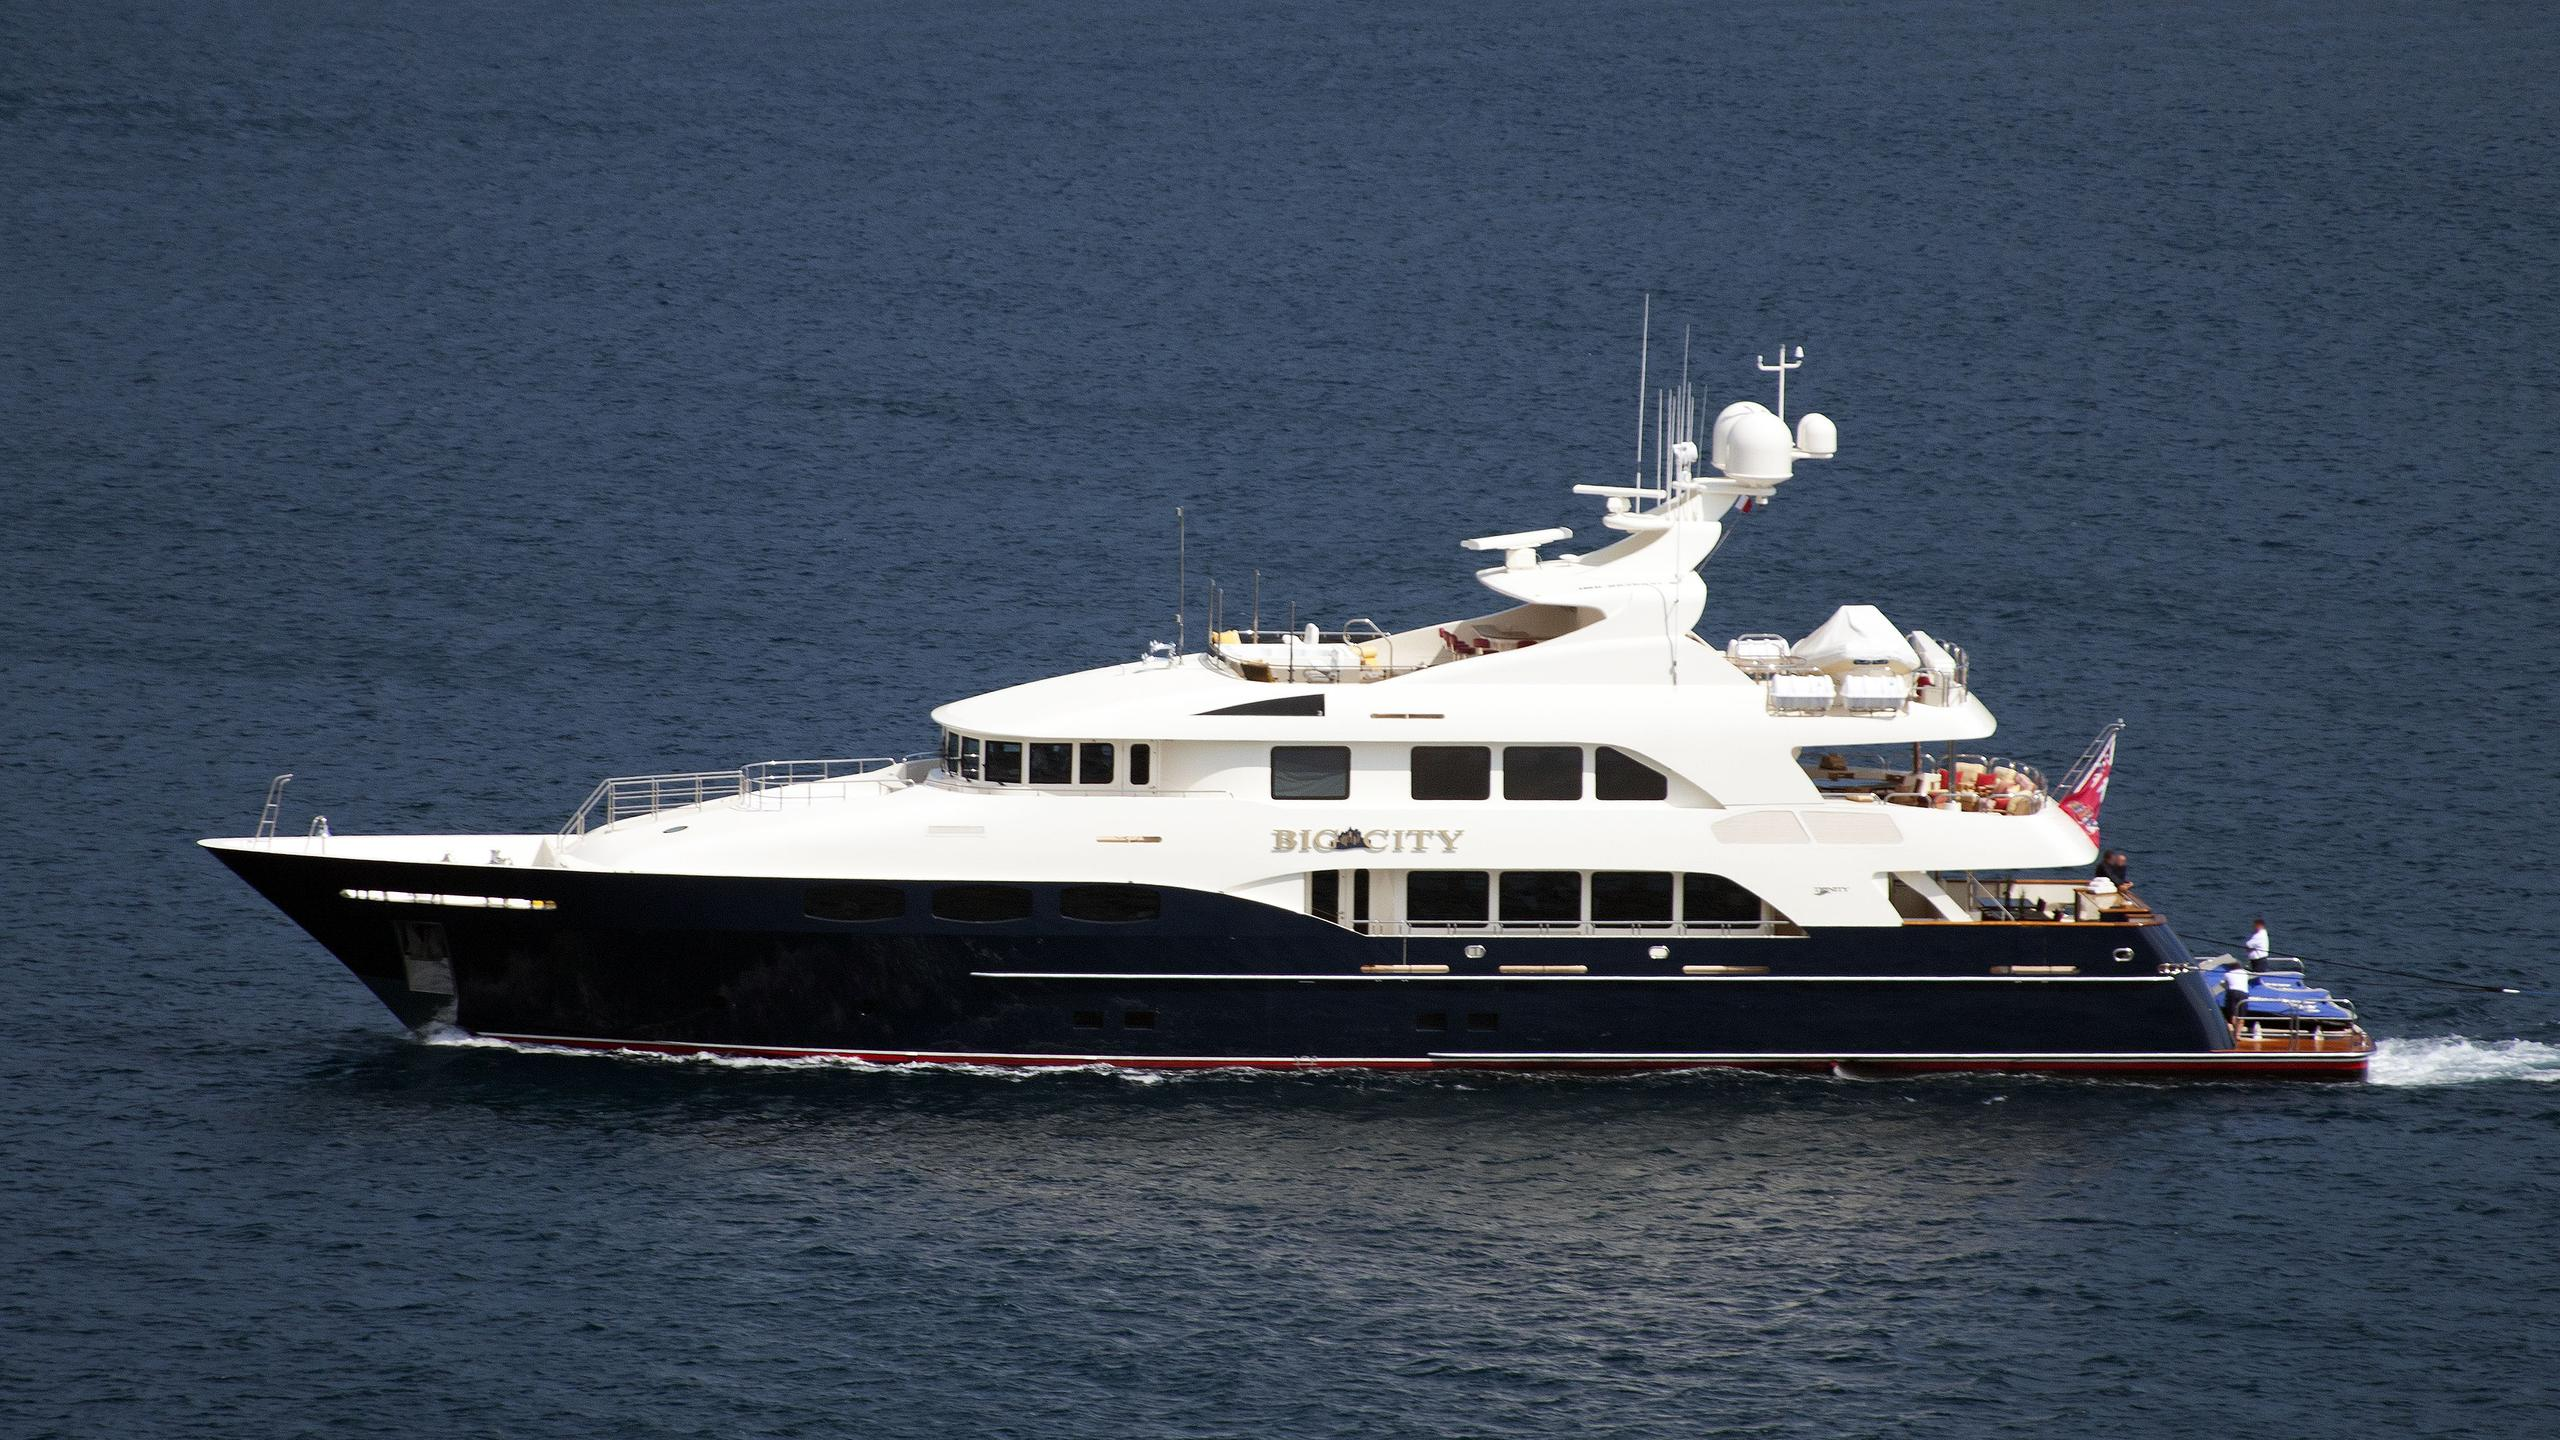 waku-motor-yacht-trinity-2009-43m-running-profile